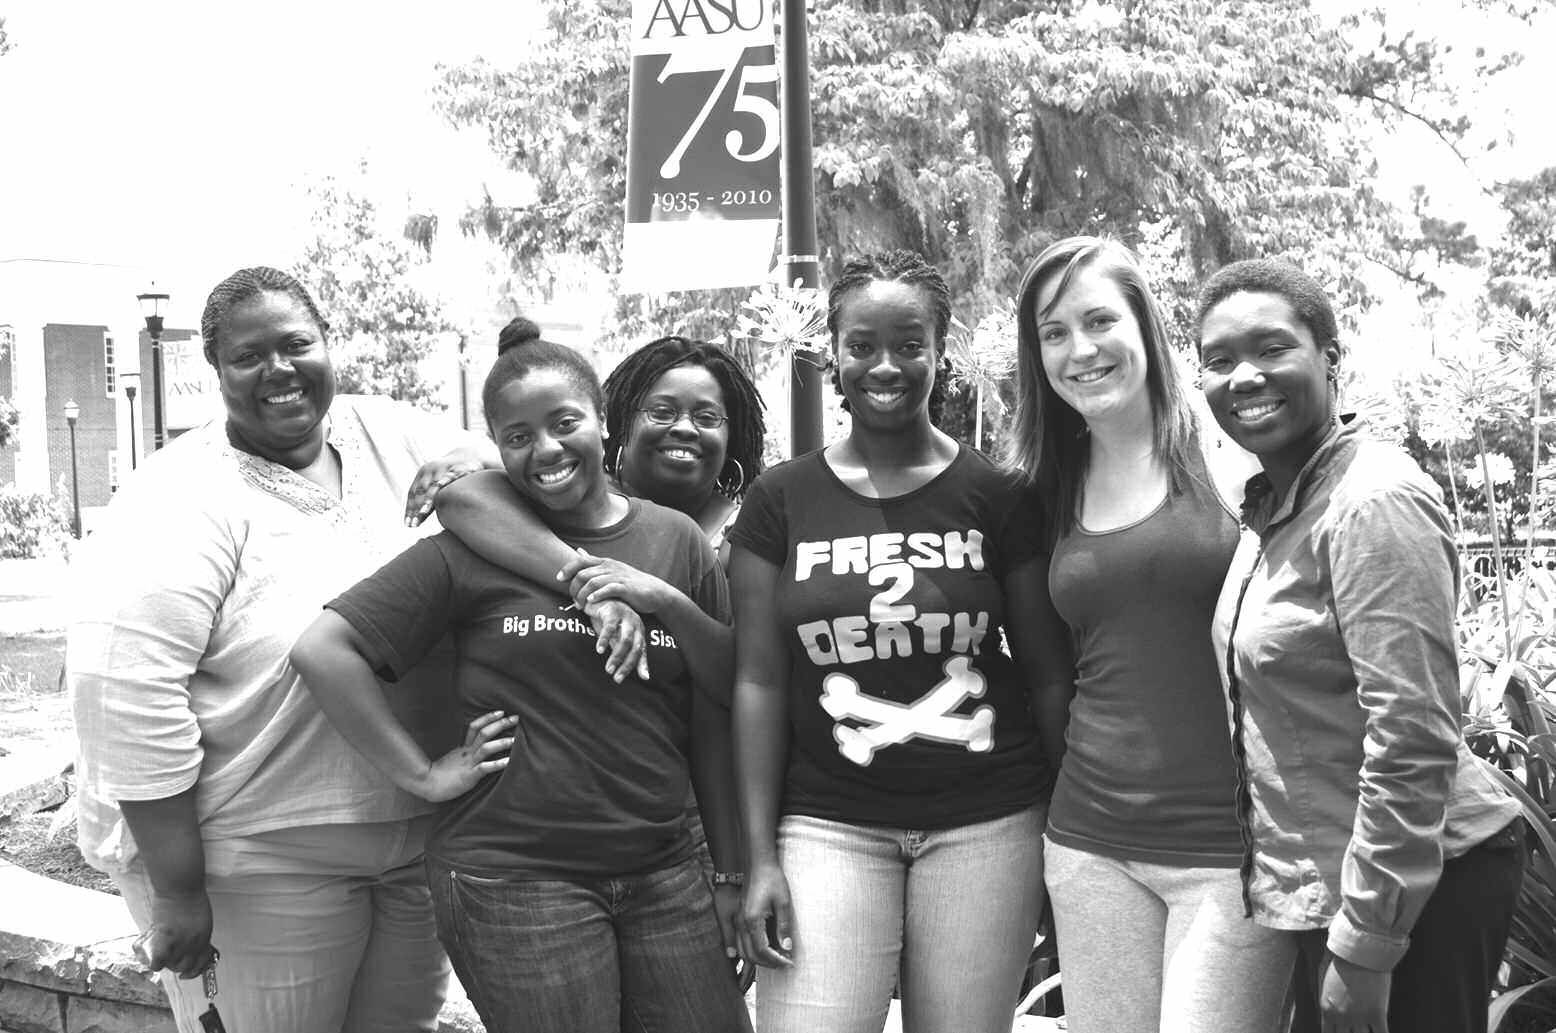 Sonya Brown (left), Jeanette Lovett, Tonya Wright (SSU), TaNika Roberts, Megan Ganser and Dr. Kalenda Eaton. Not pictured: Patrina Lingard.